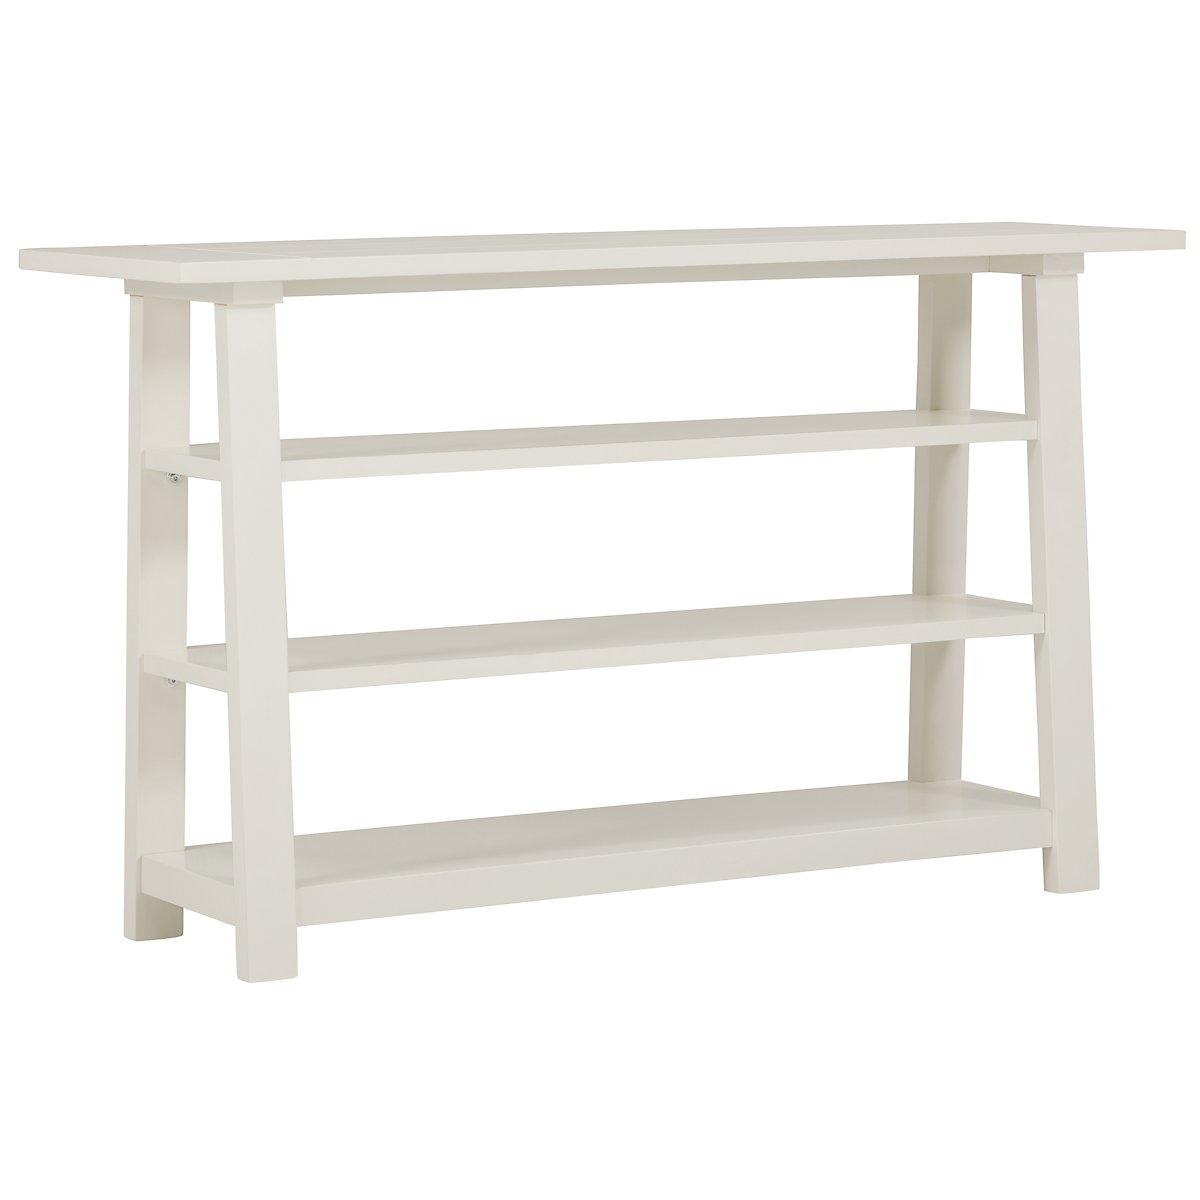 White sofa table - Quinn White Sofa Table View Larger